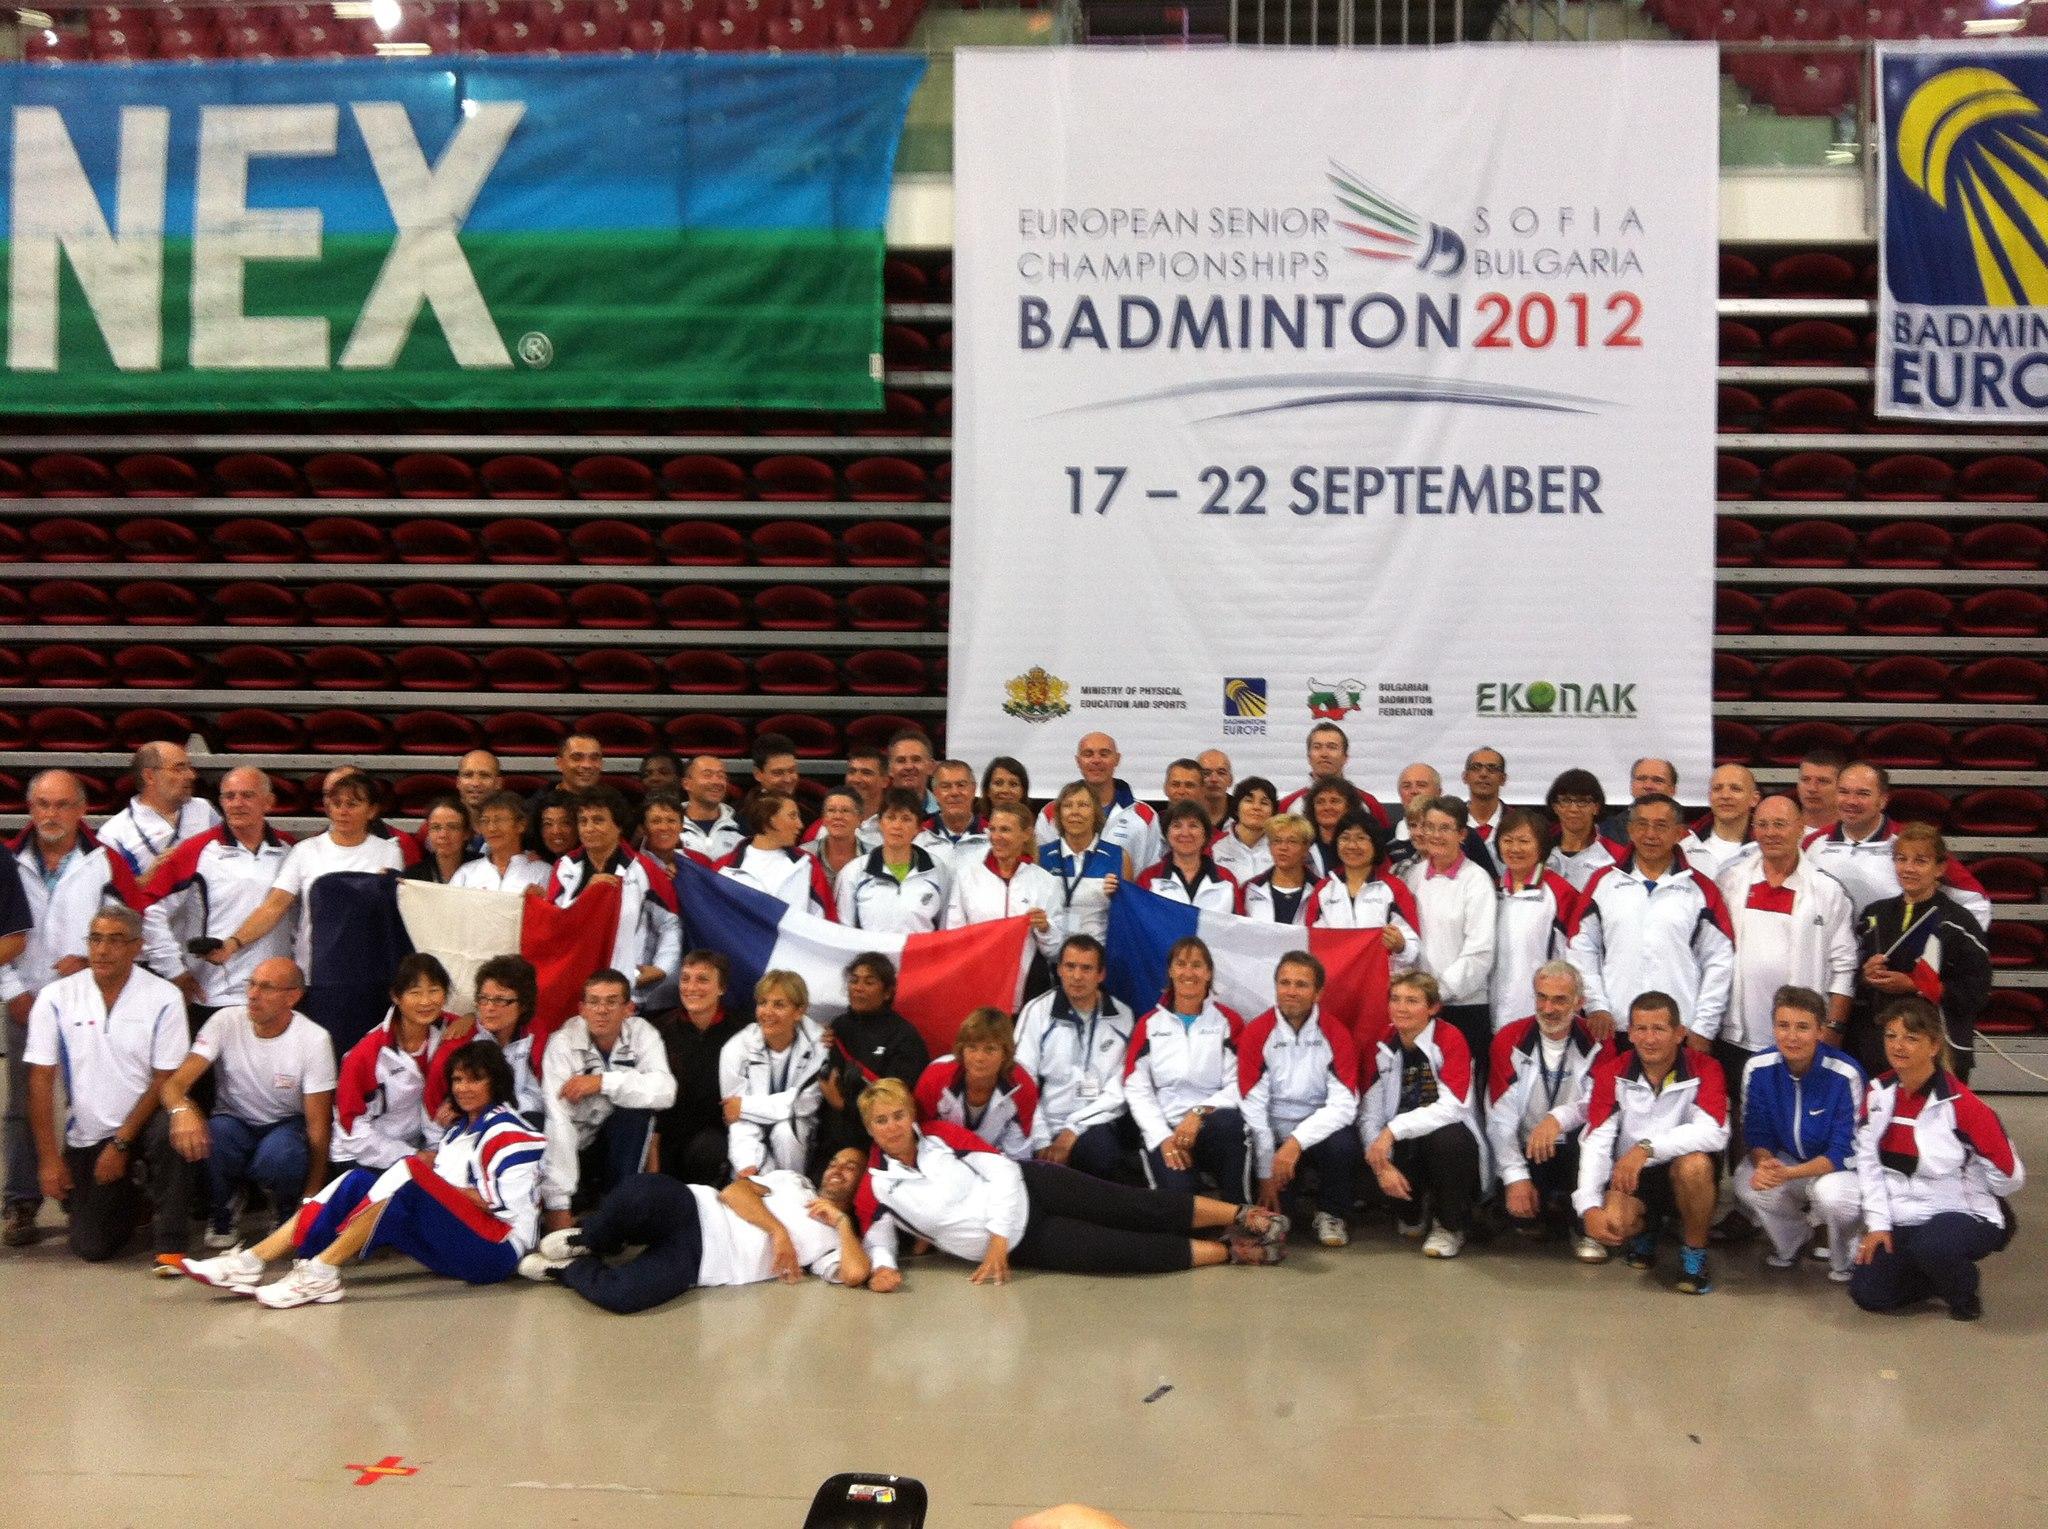 https://www.bcetupes.info/wp-content/uploads/2012/09/oliver-aymard-championnat-europe-2012.jpg